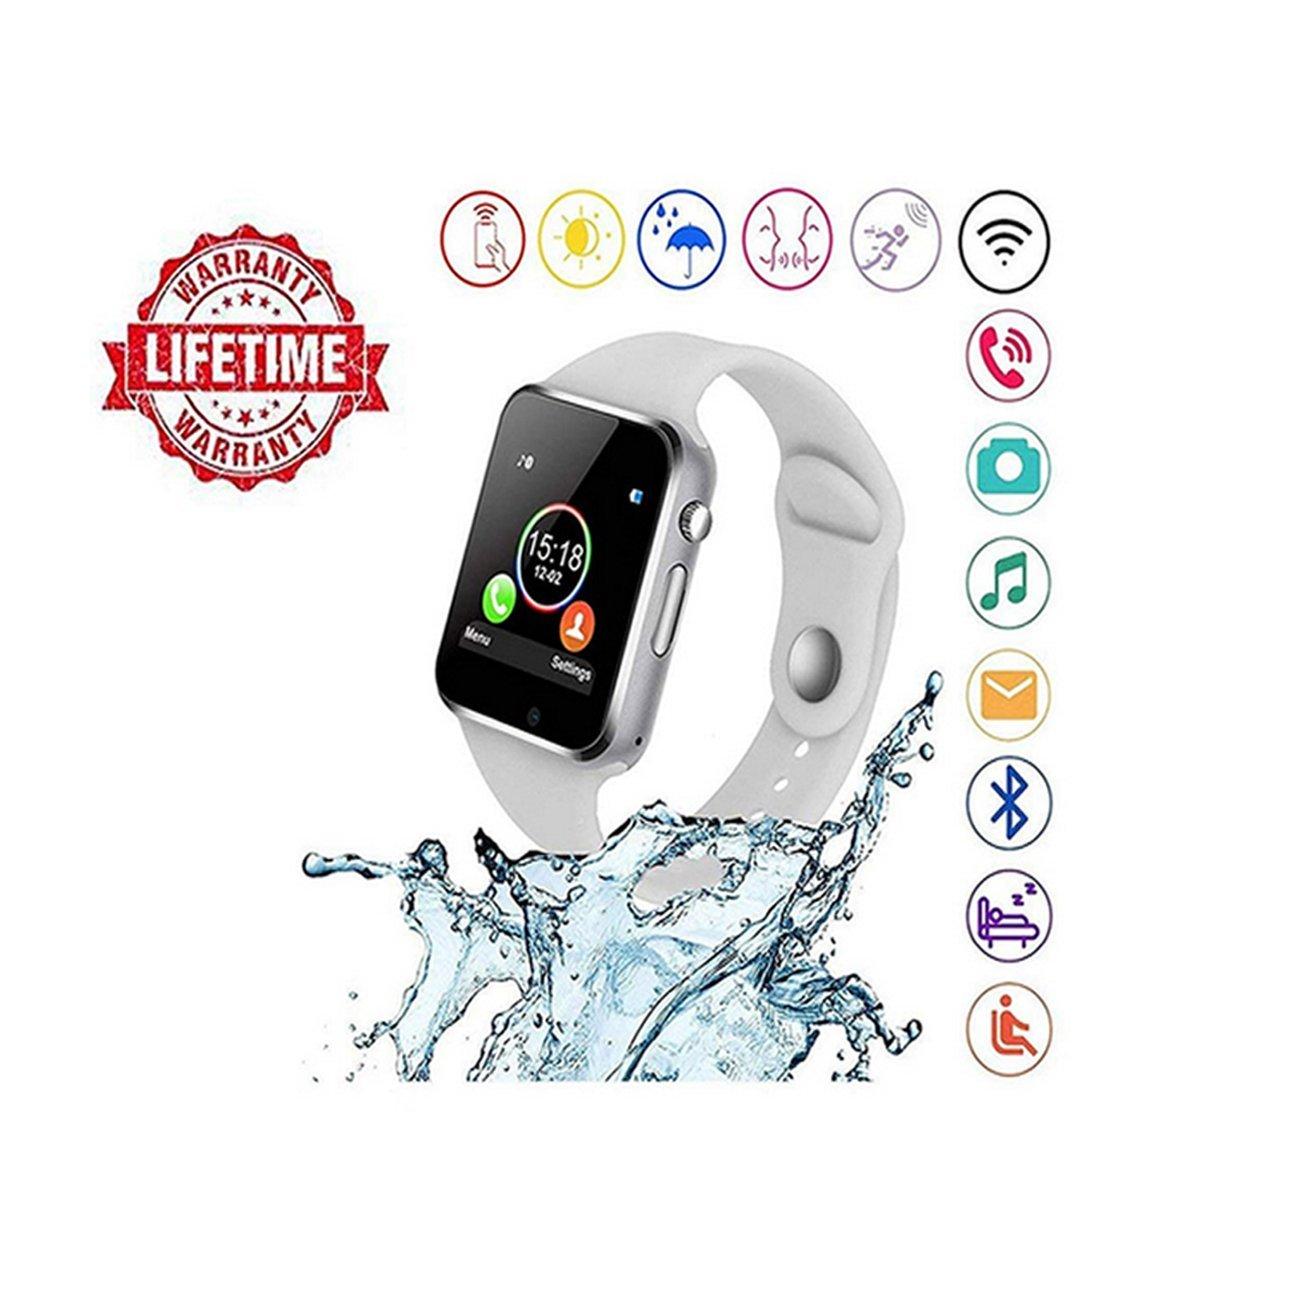 Smart Watch Android,HongTu Bluetooth Smart Watch Touchscreen Camera Pedometer SIM TF Card Slot LG XiaoMi Huawei Samsung iOS Mens Women (White'')